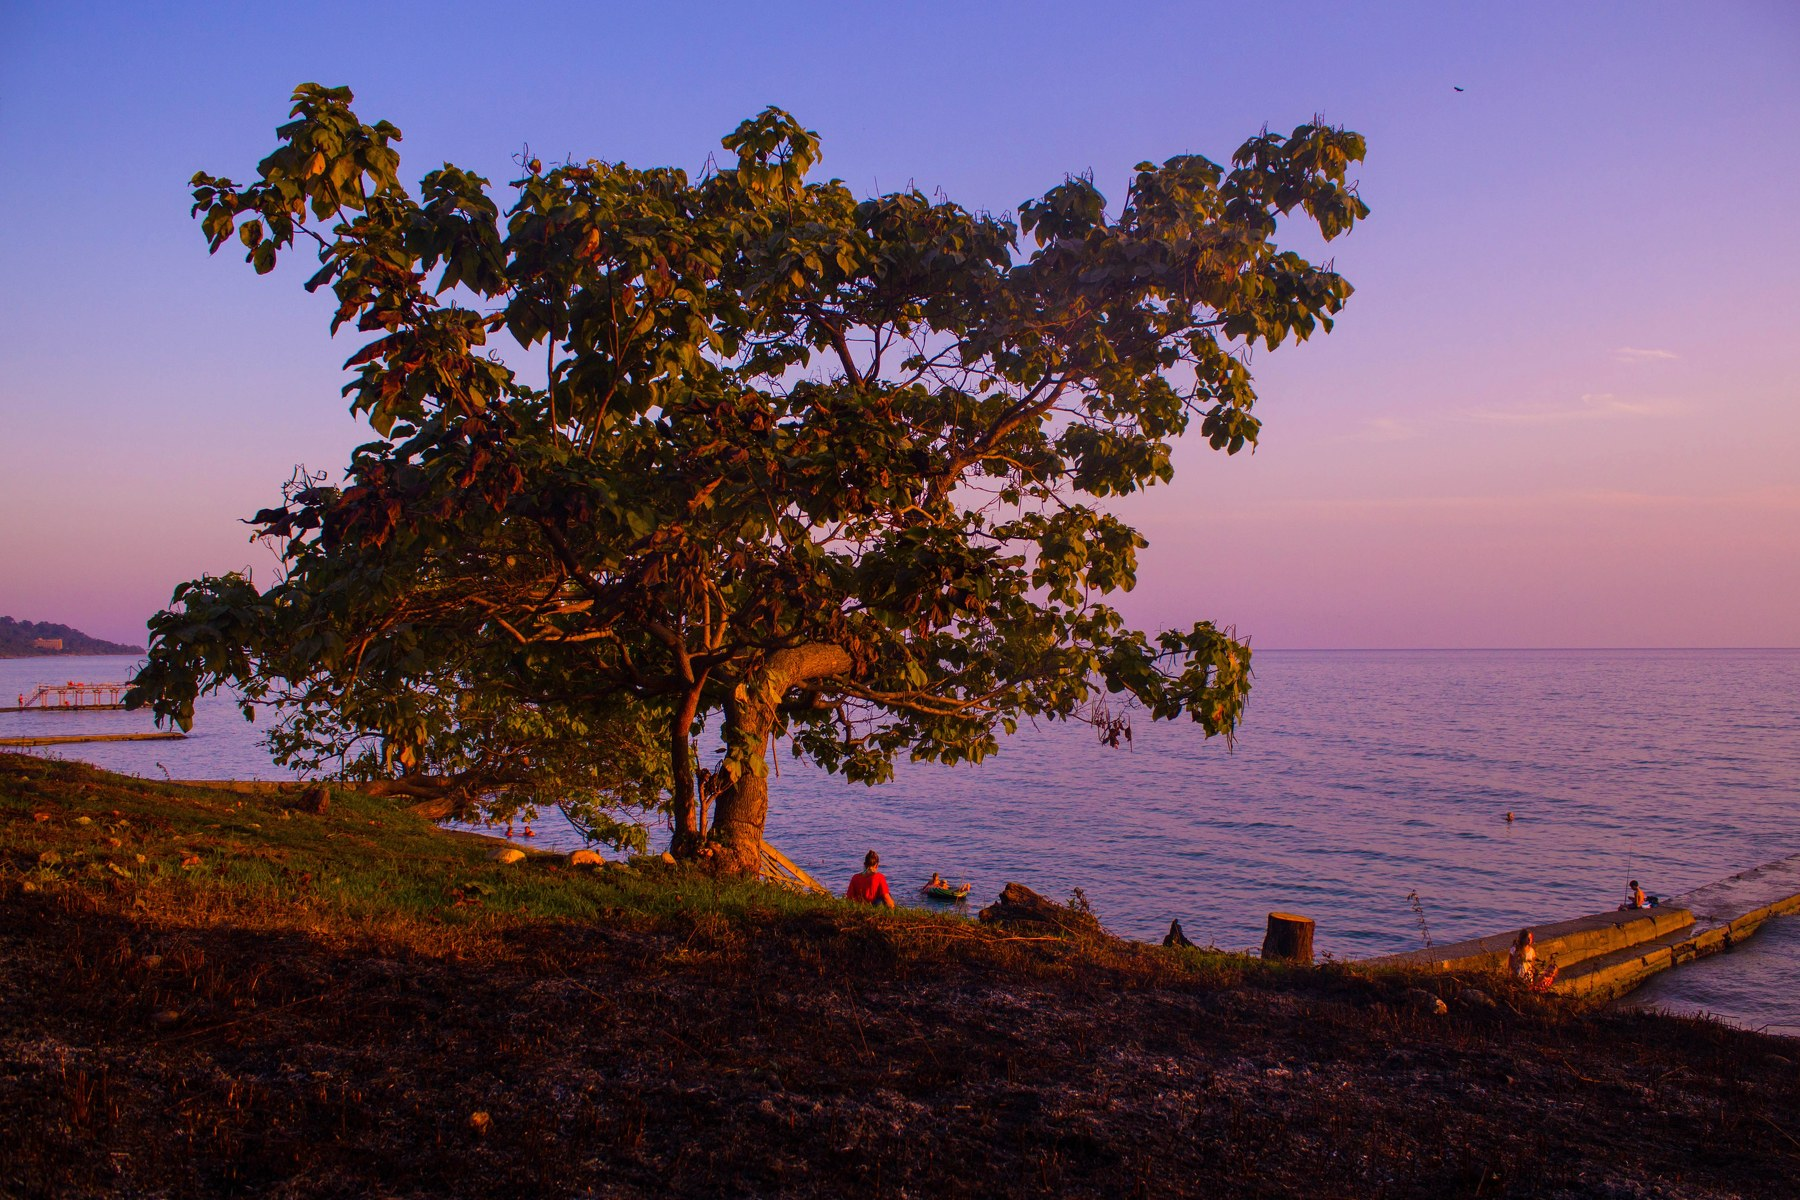 закат, море, эвкалипт, деревья, тепло, солнце, небо, Салтыкова Алёна